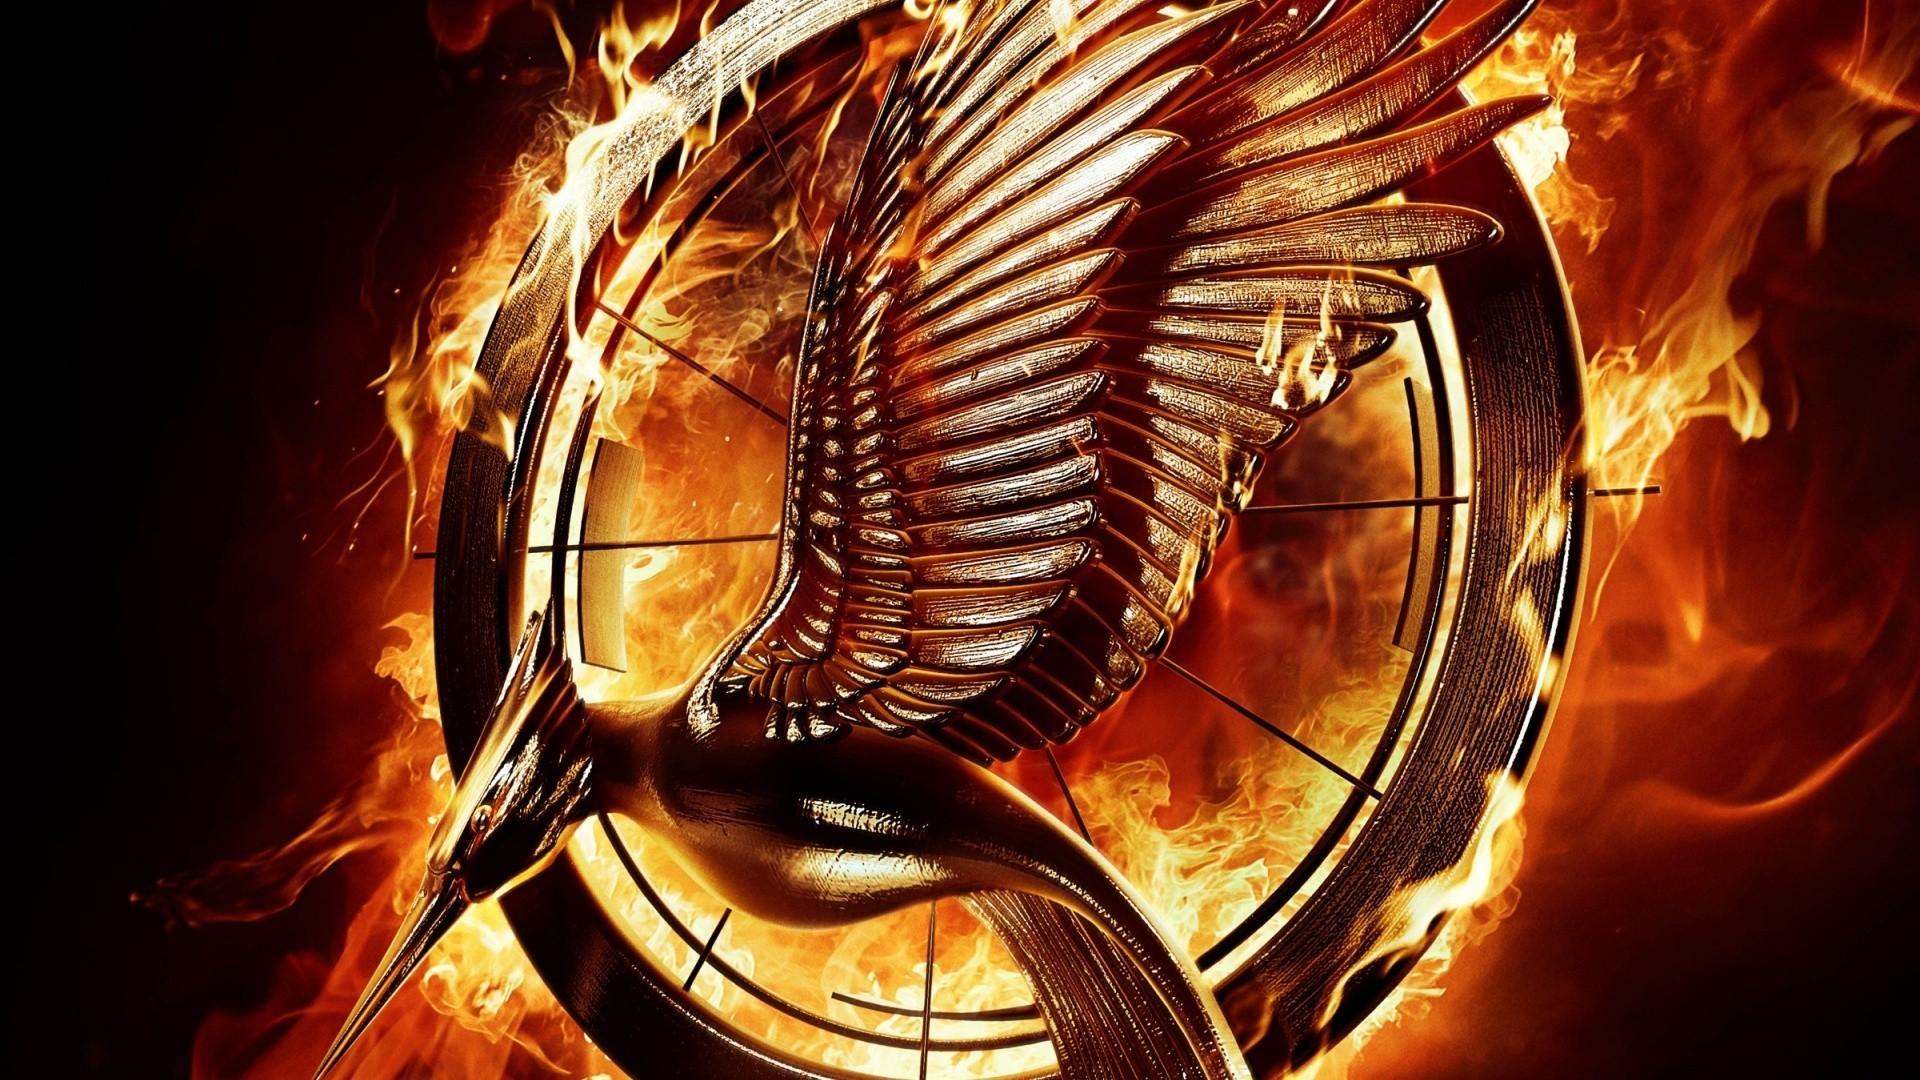 The Hunger Games MockingJay Pin widescreen wallpaper | Wide ...